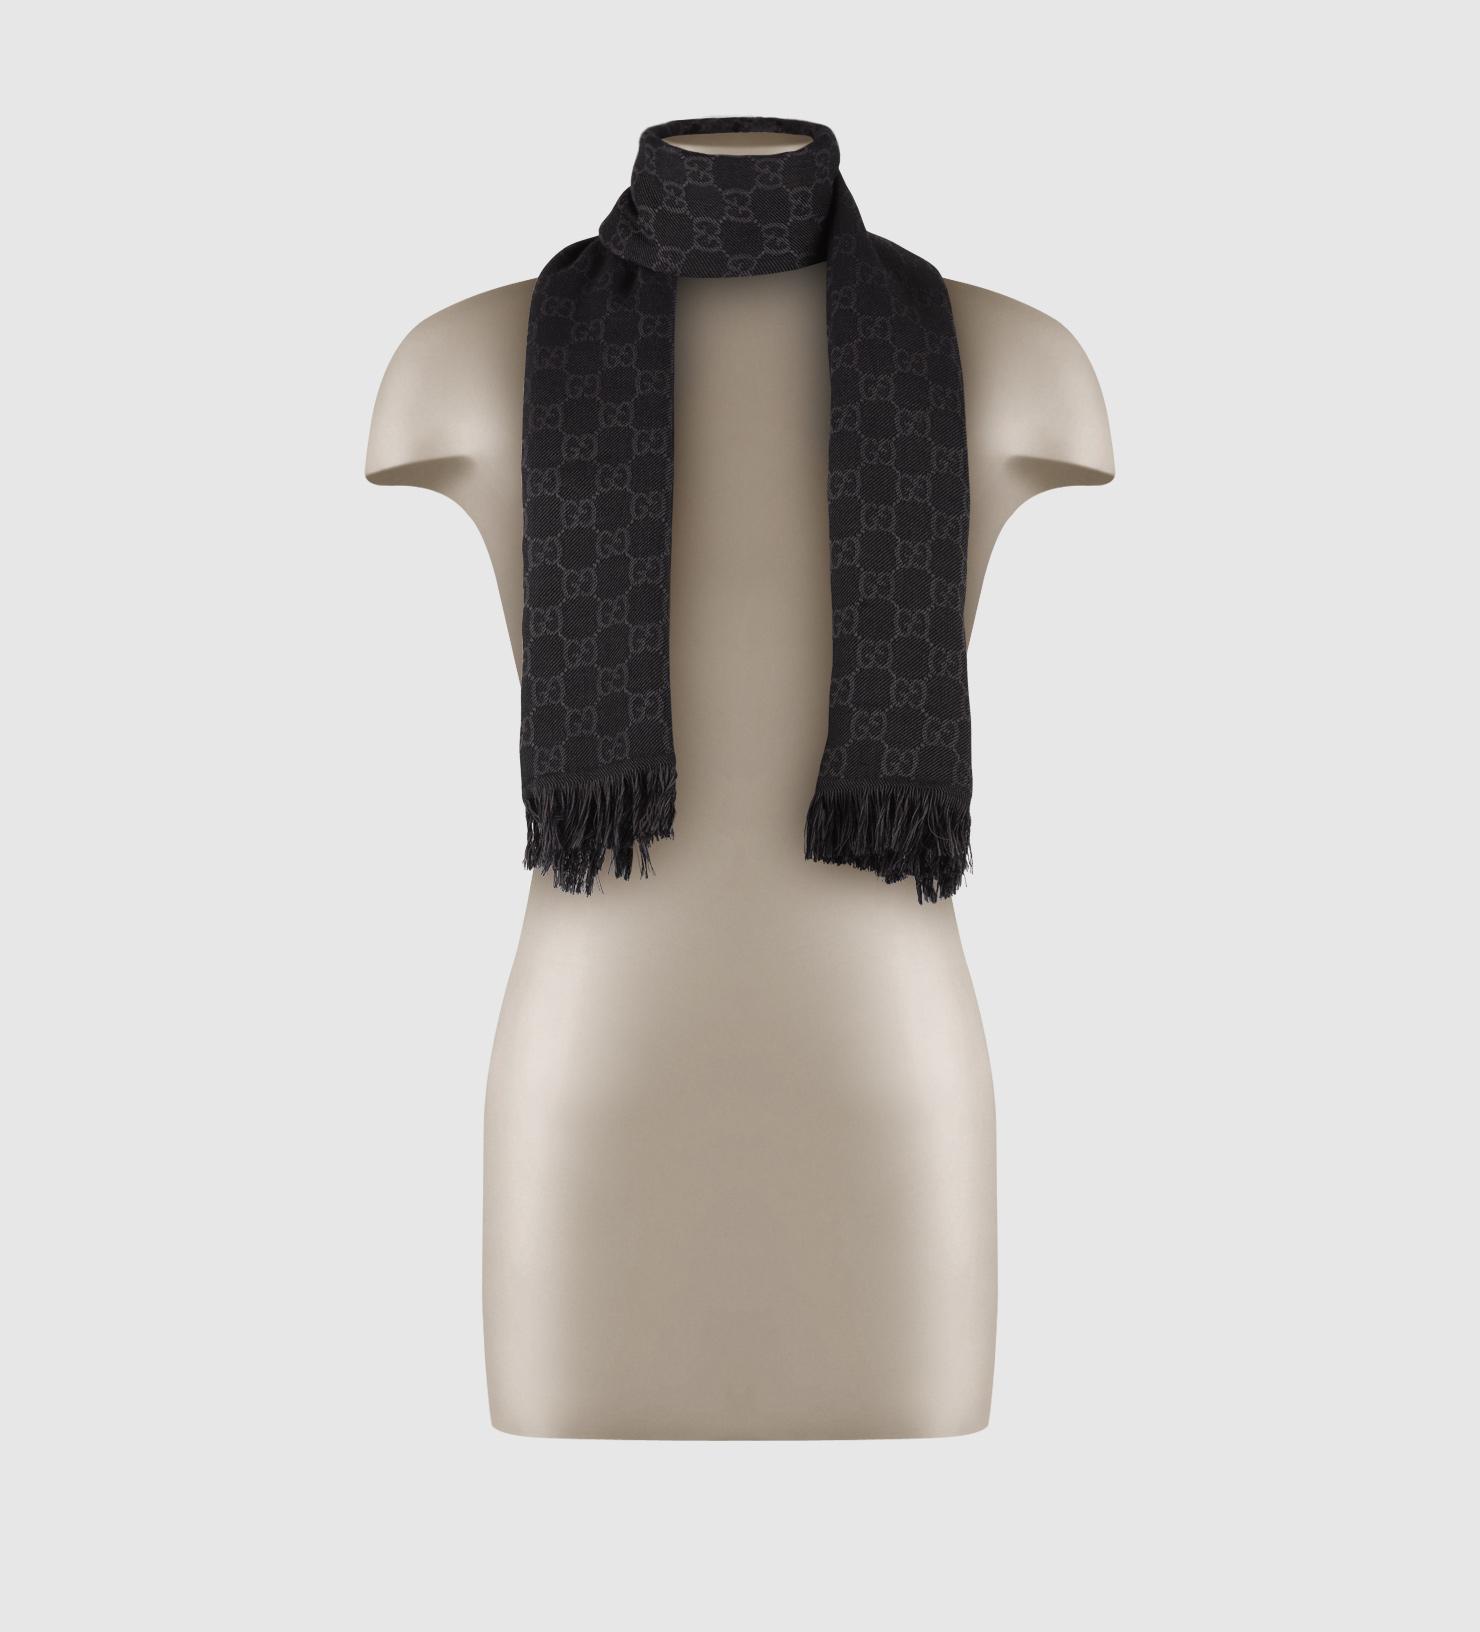 GG jacquard pattern knitted scarf - Black Gucci xkxyQ92d